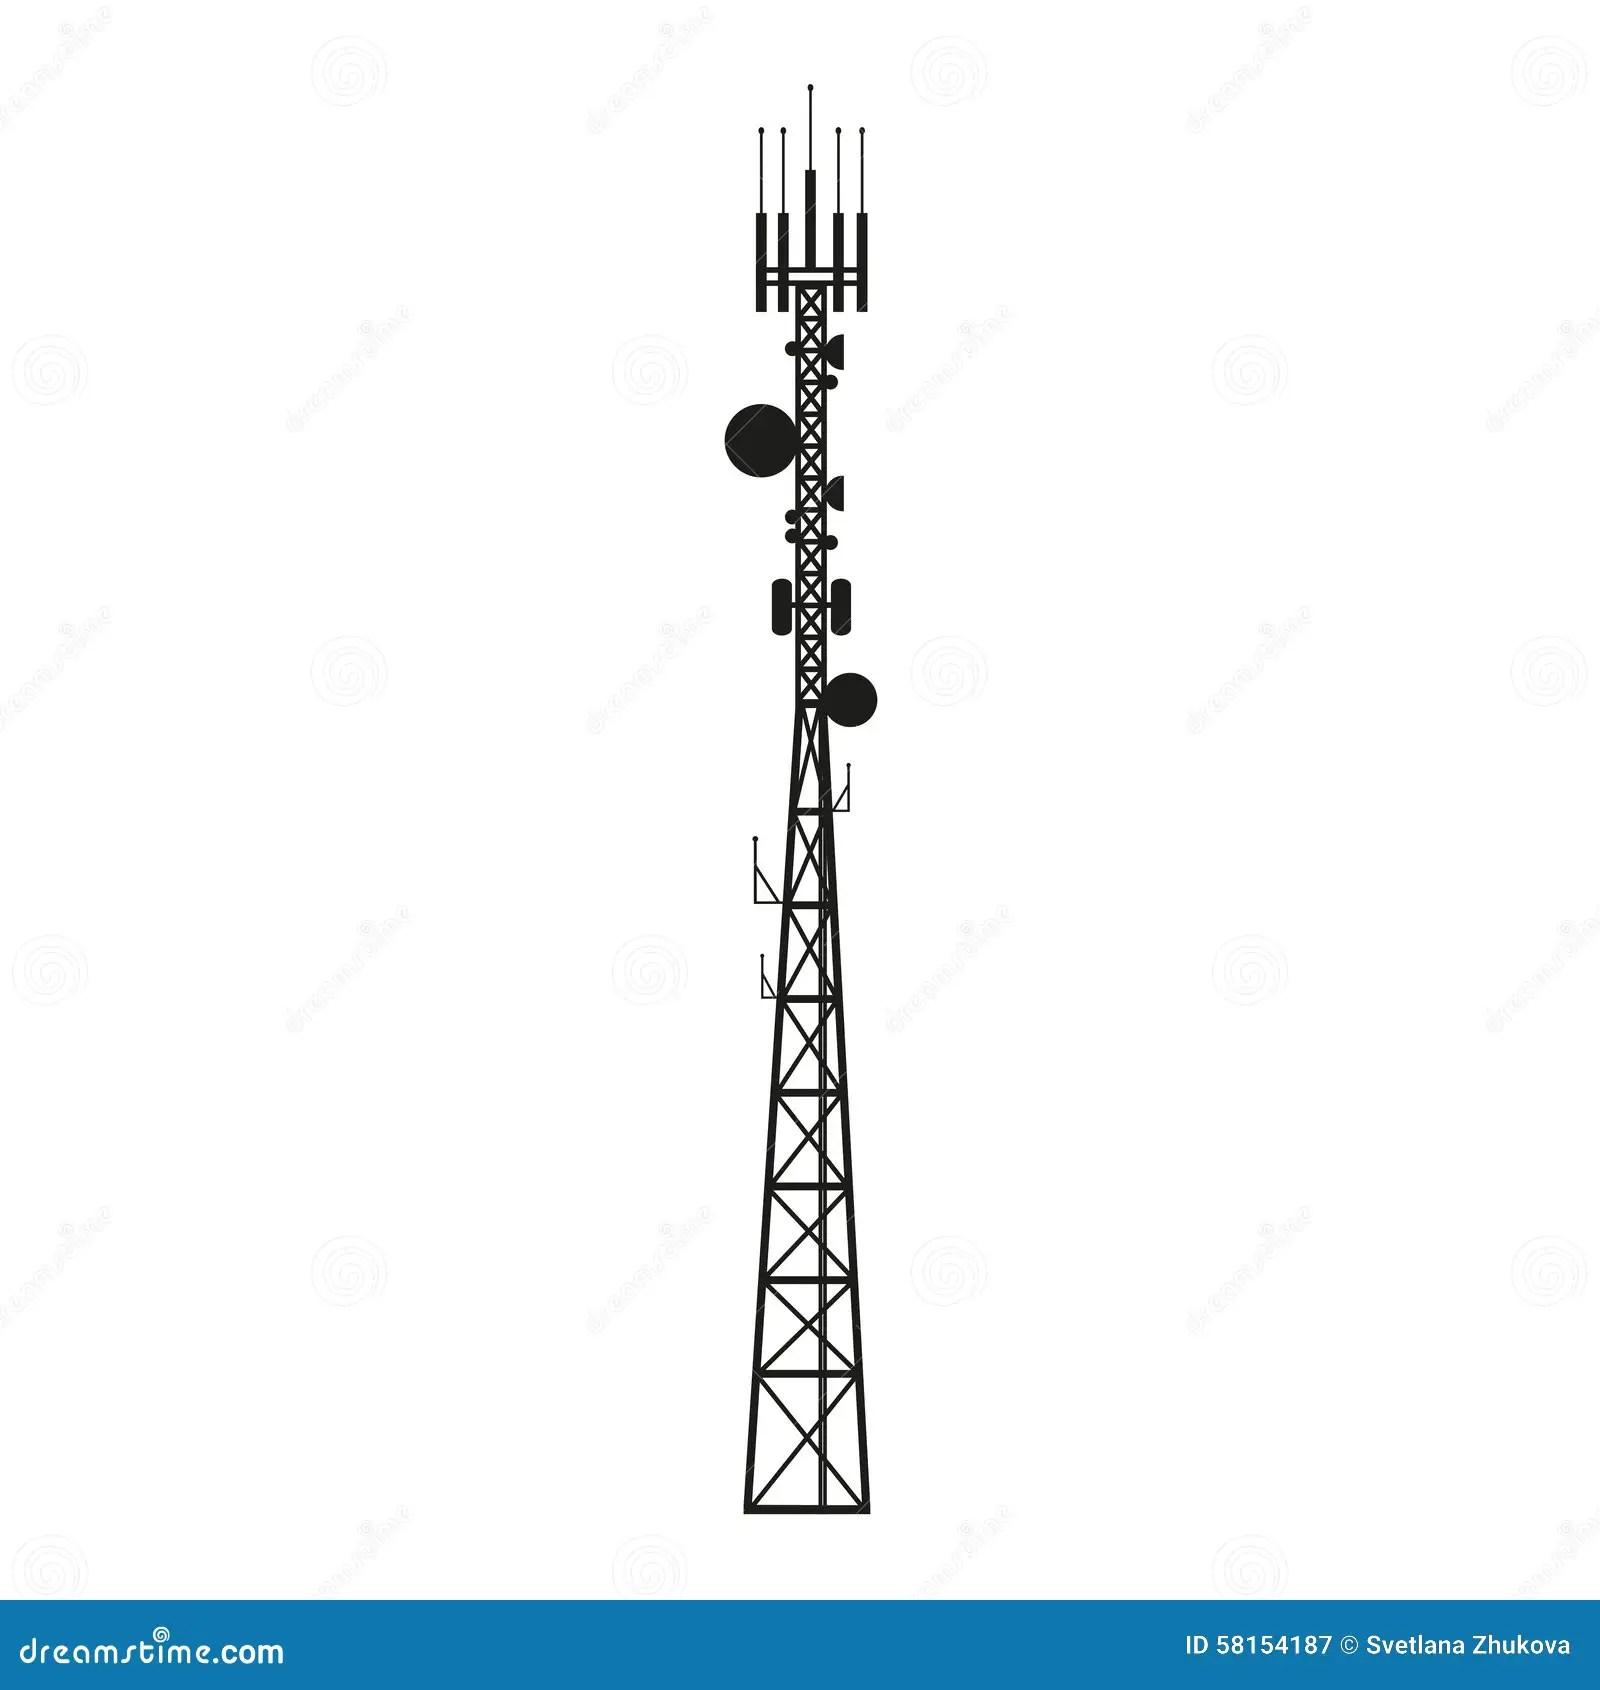 cellular phone tower signal diagram 94 cherokee radio wiring telecommunication antenna mast or mobile stock